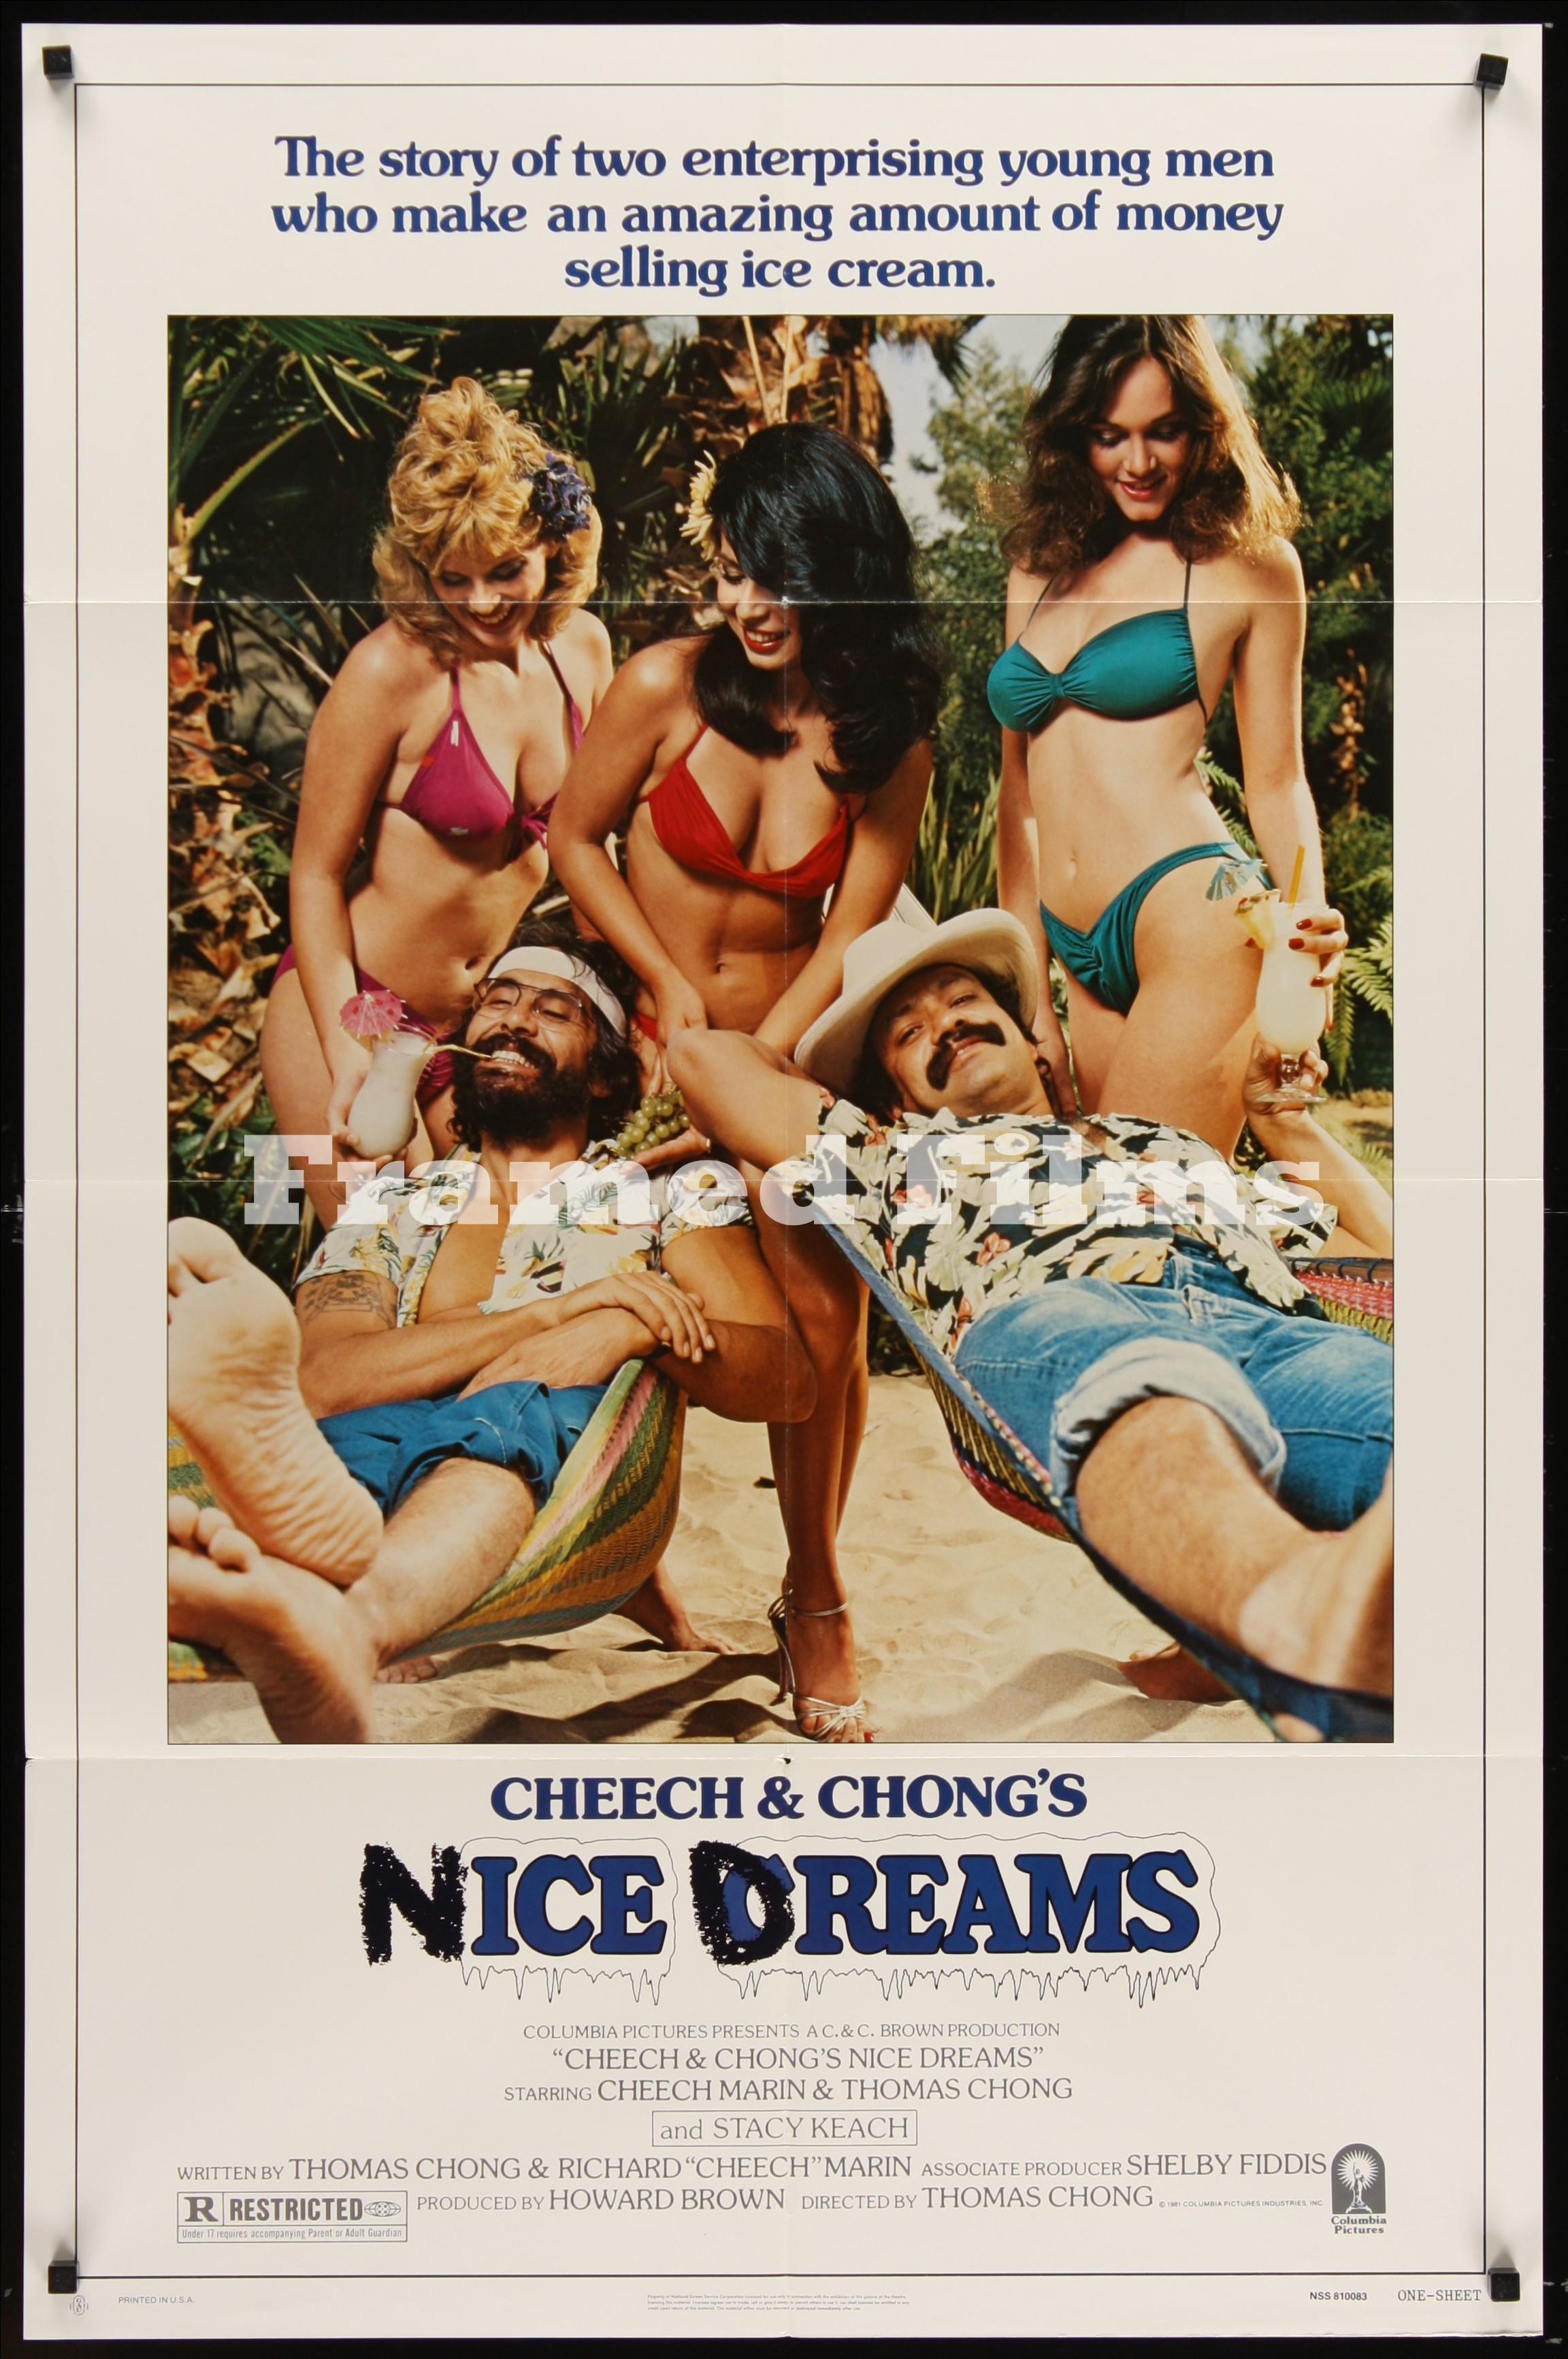 cheech_and_chongs_nice_dreams_NZ03619_L.jpg